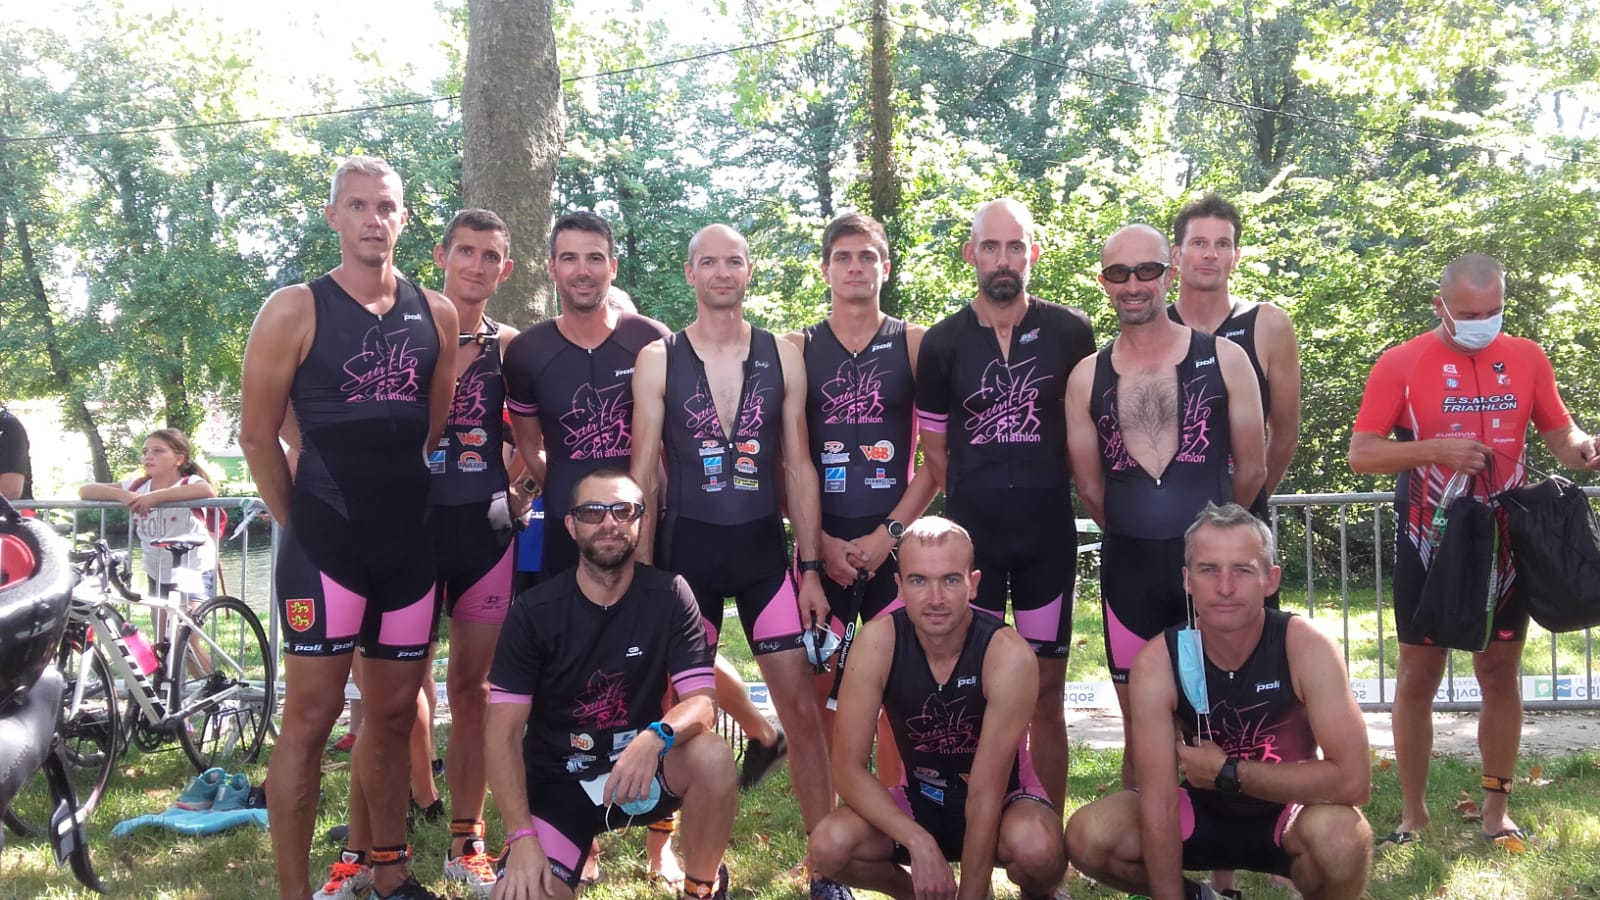 Triathlon de Caen par équipe